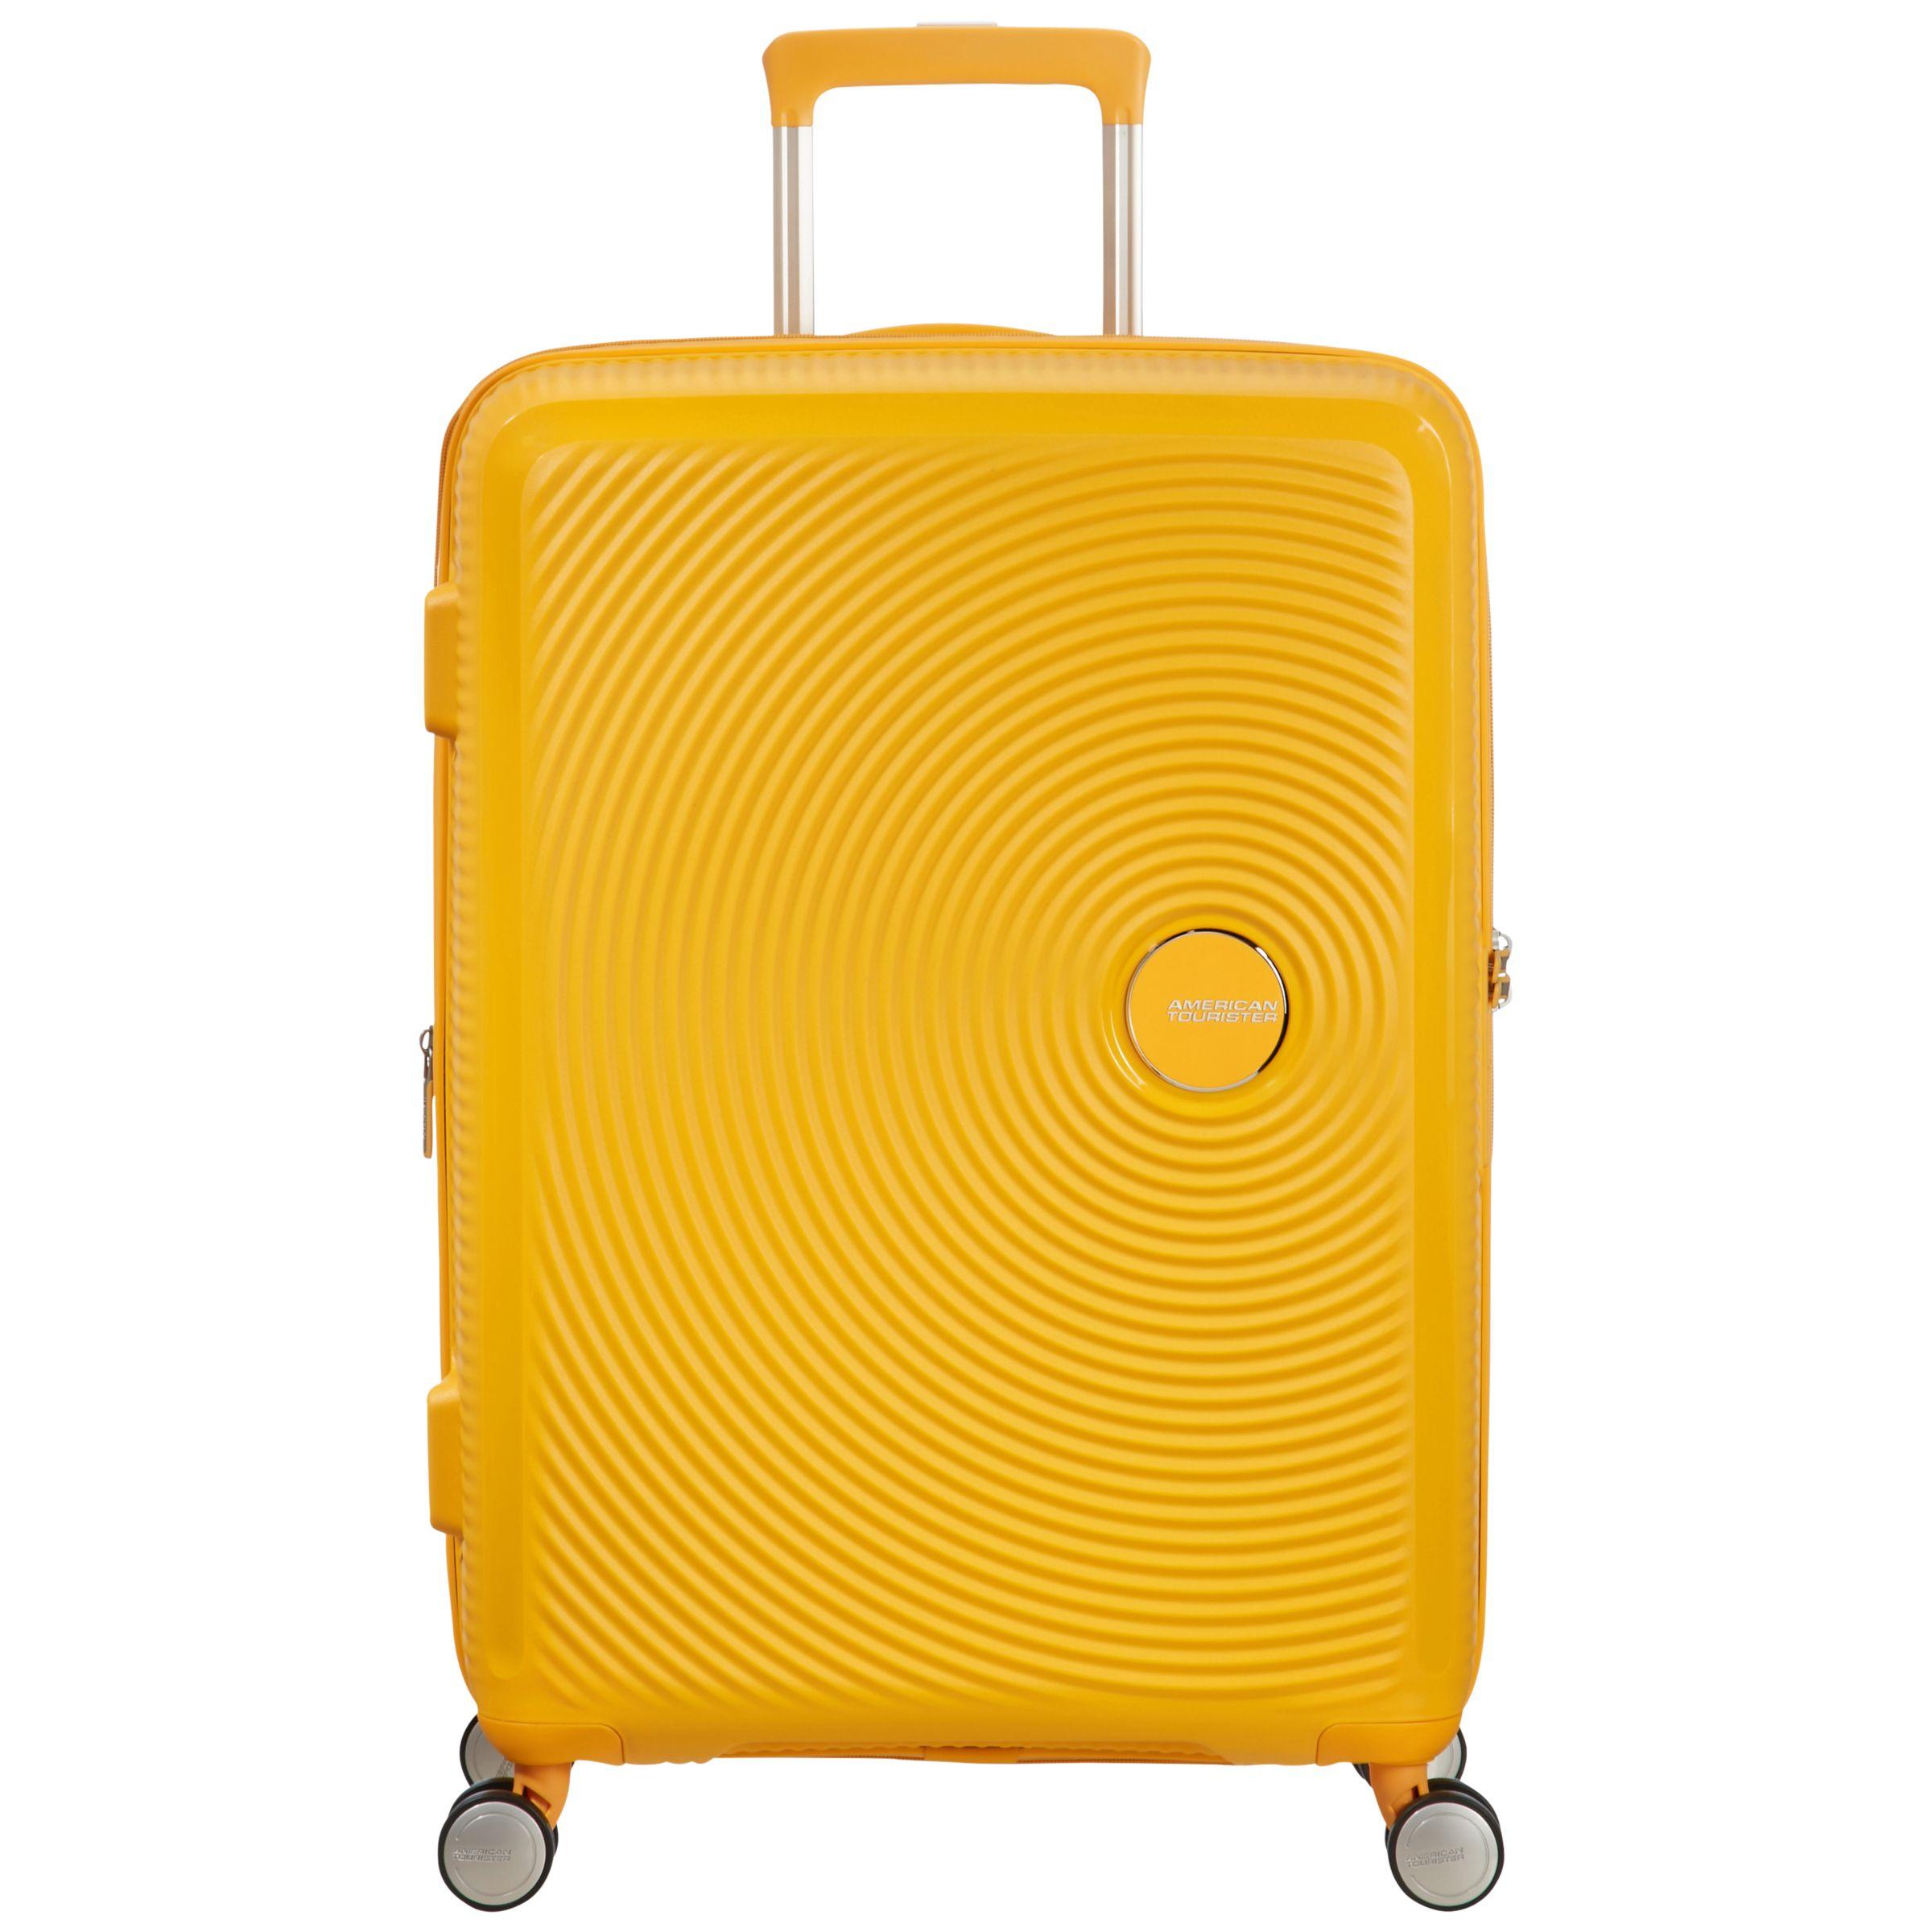 American Tourister American Tourister Soundbox 4-Spinner Wheel 67cm Medium Suitcase